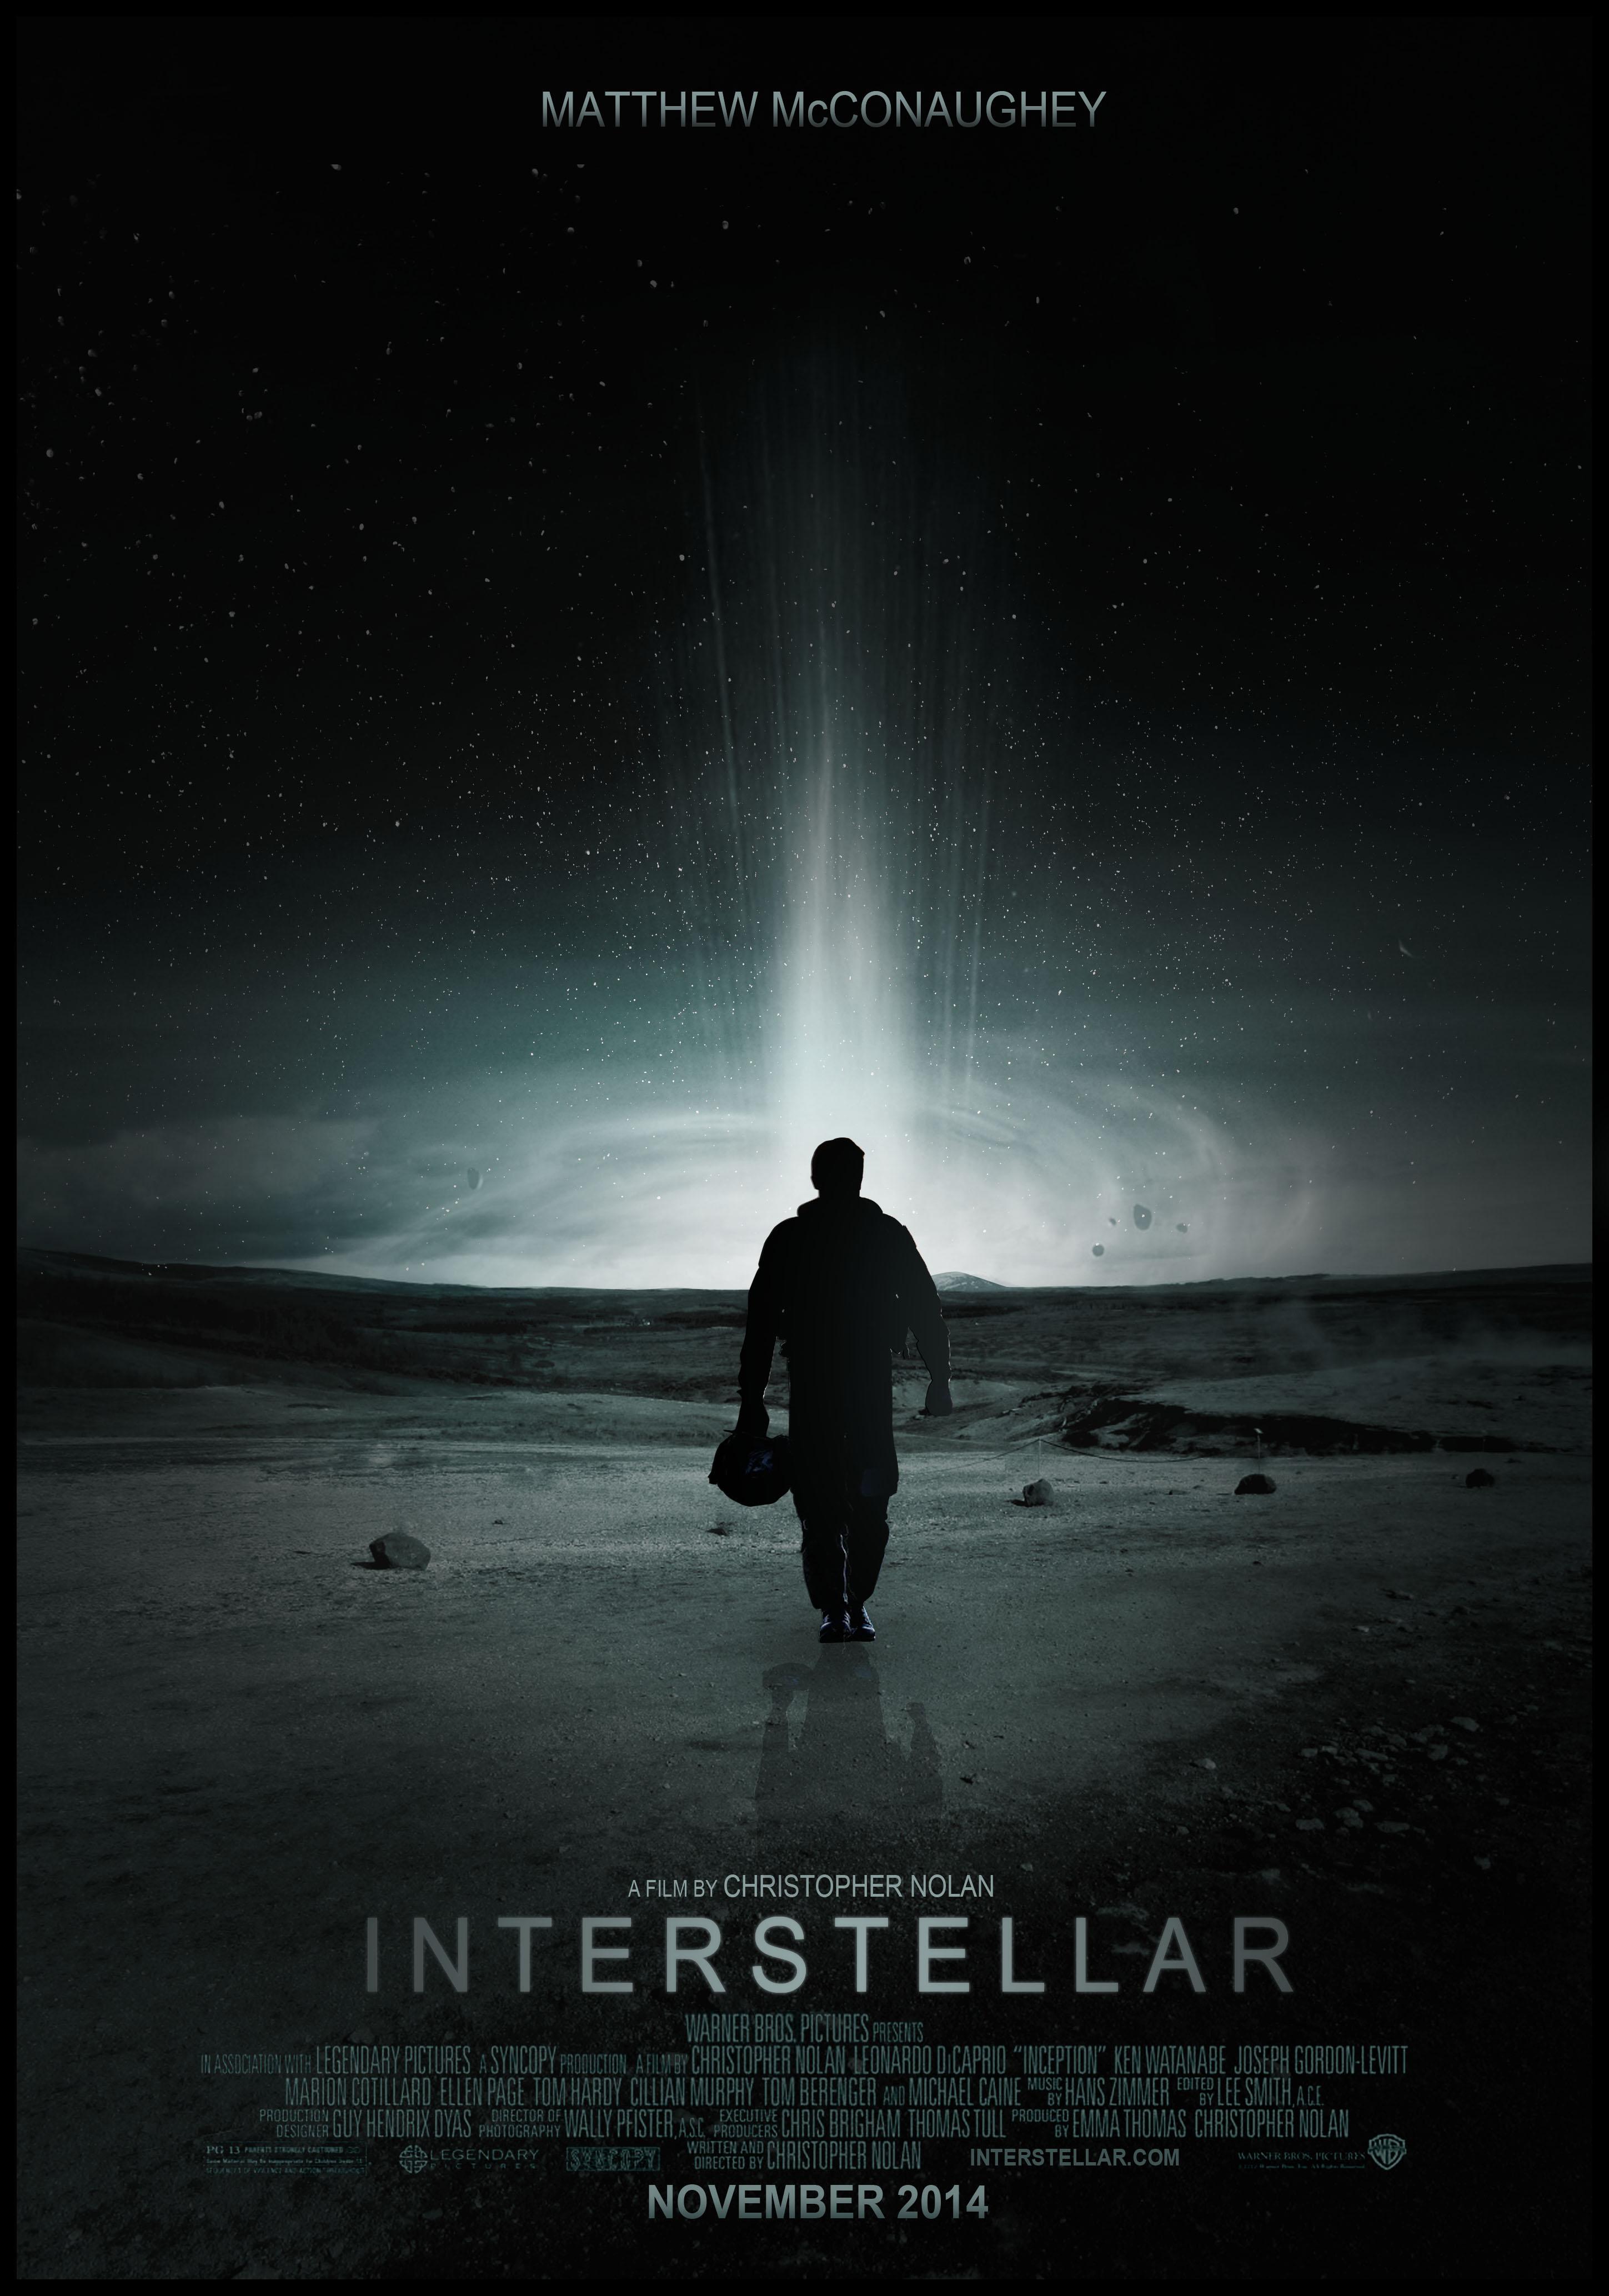 https://i0.wp.com/www.sfportal.hu/wp-content/uploads/2013/08/interstellar.jpg